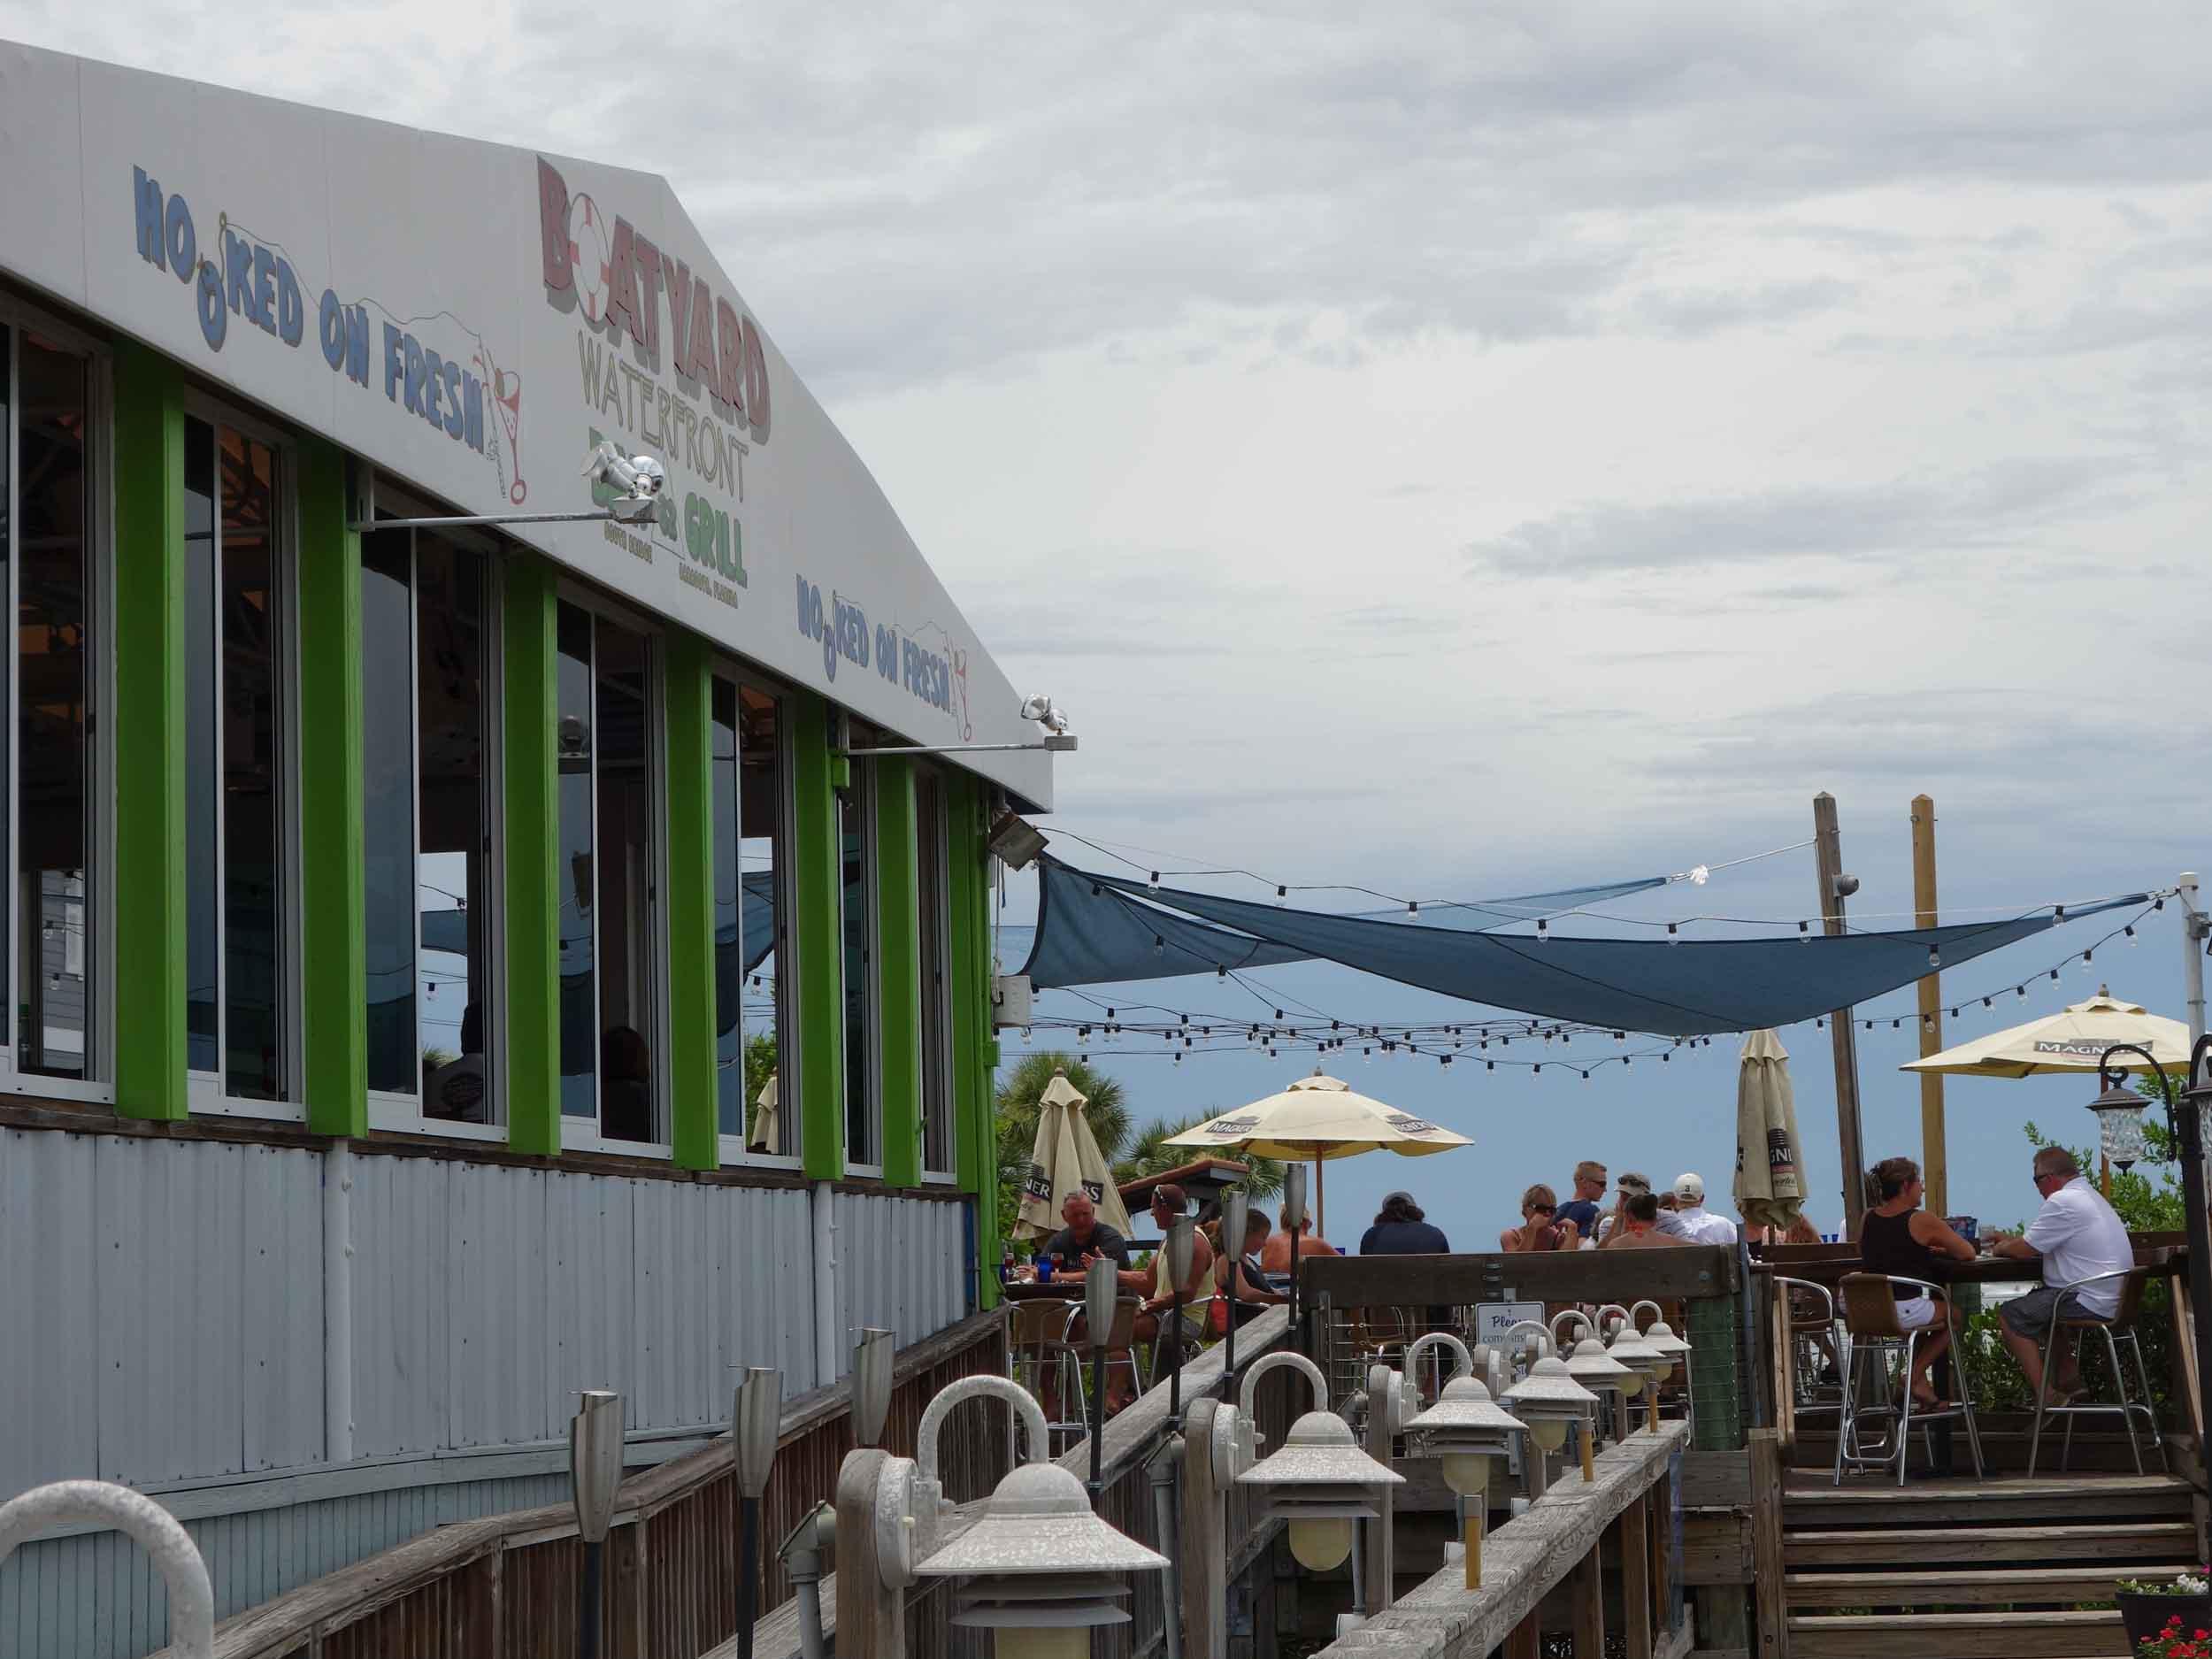 Boatyard Waterfront Bar and Grill Patio